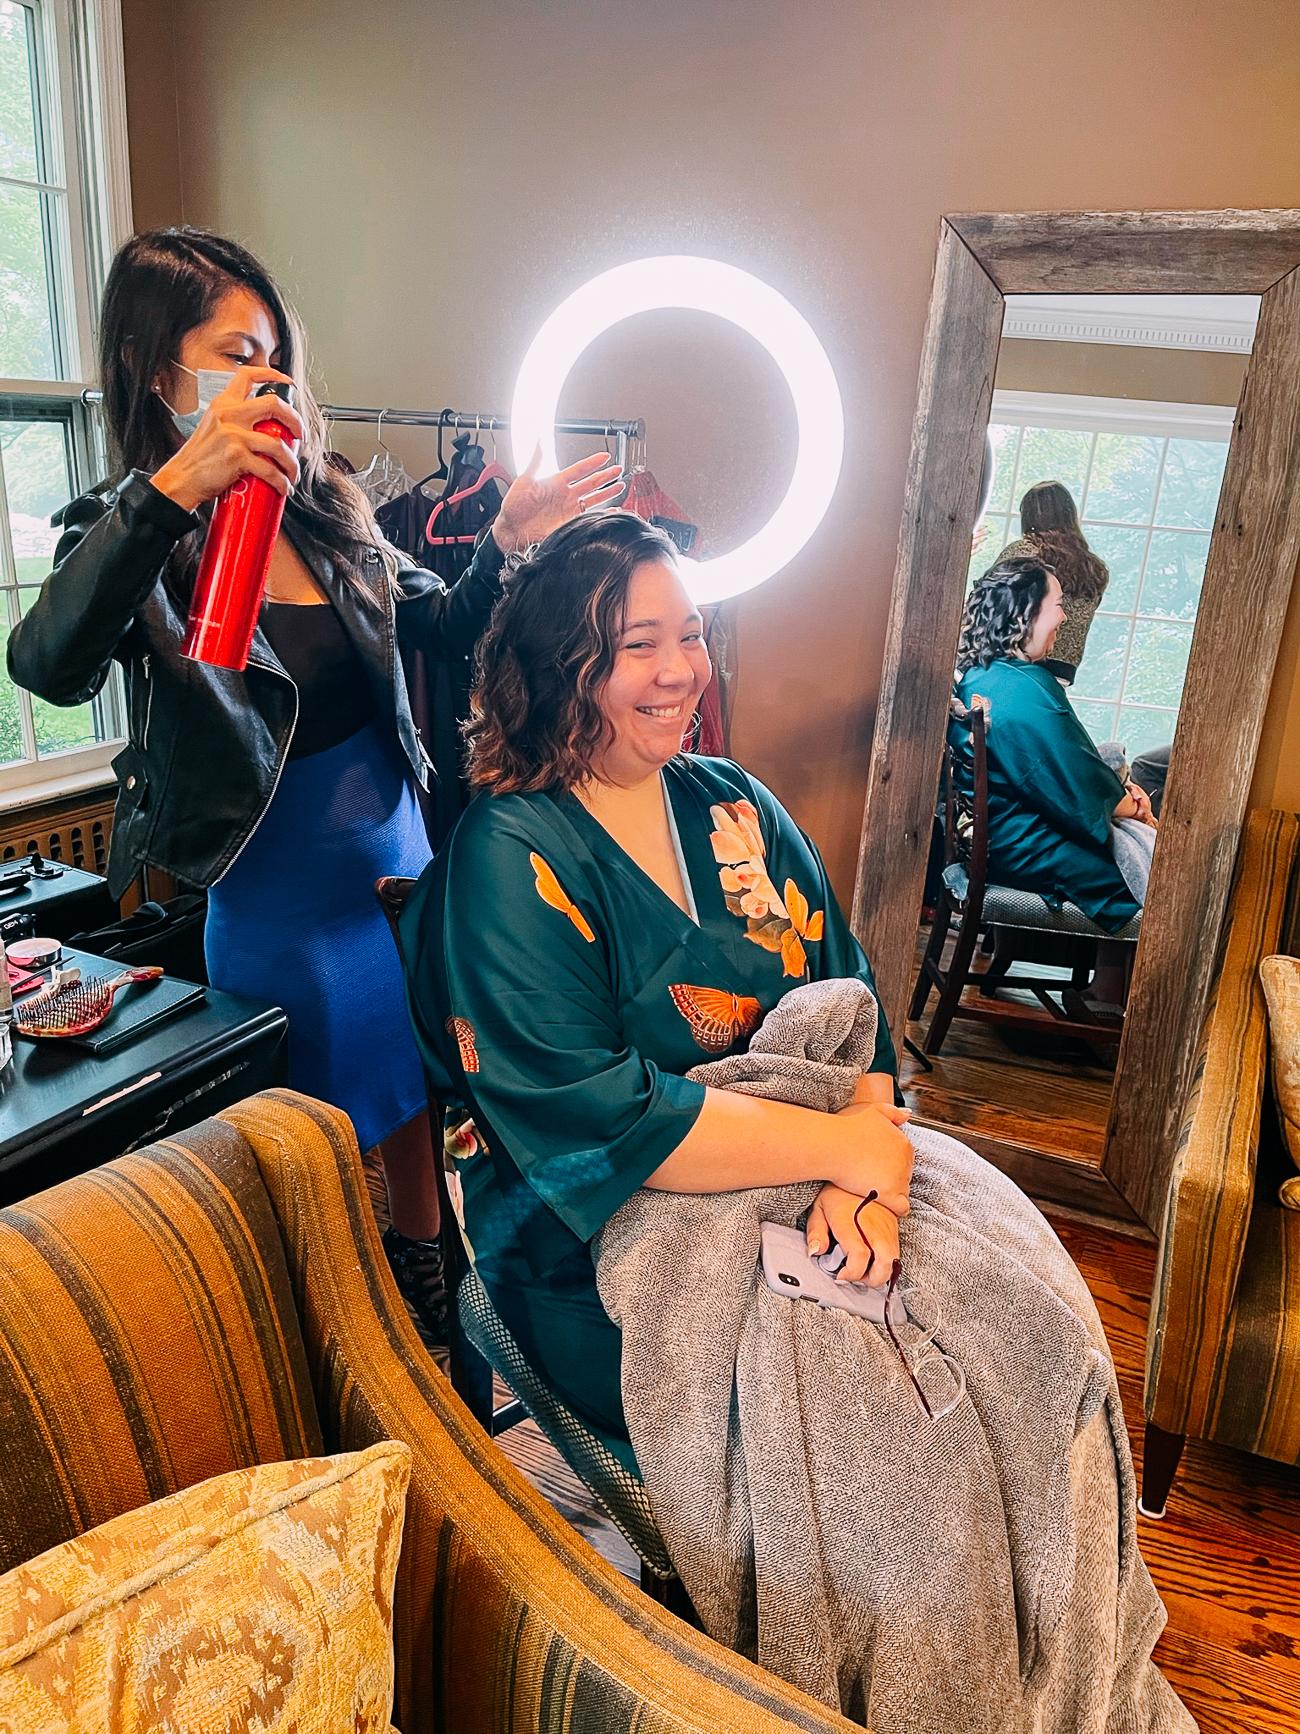 Kim getting her hair done